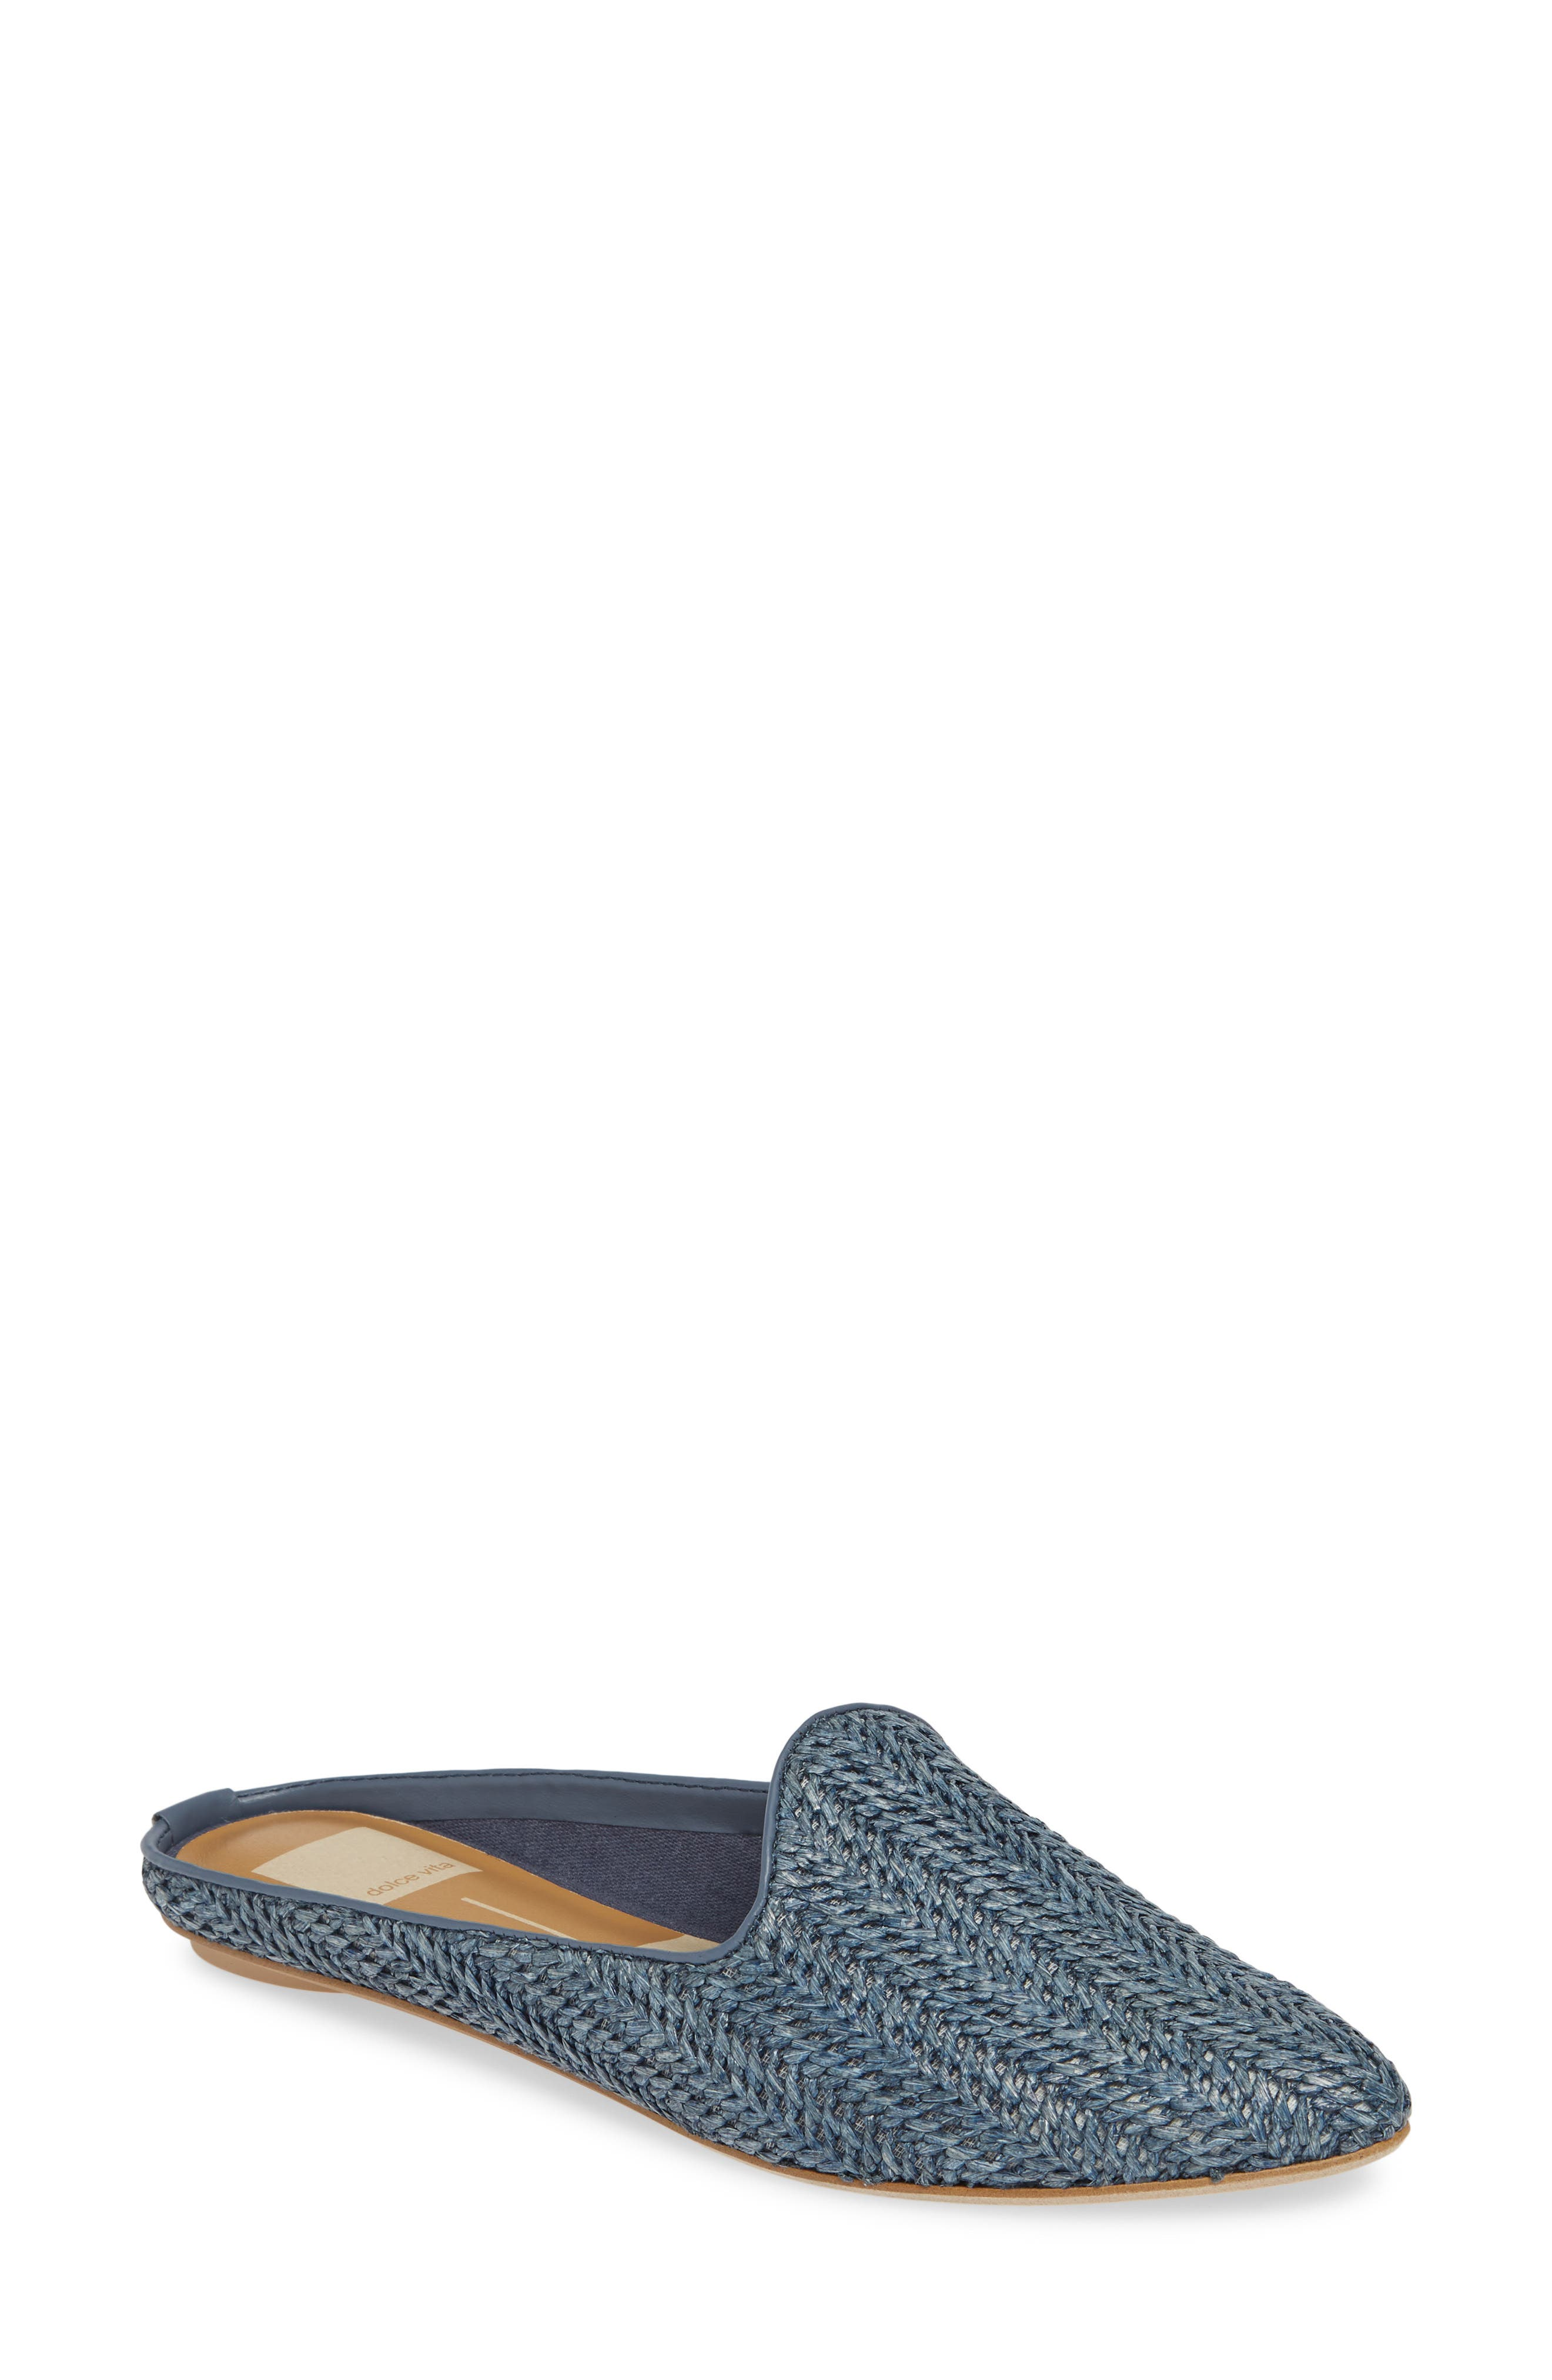 Dolce Vita Grant Woven Flat Mule, Blue